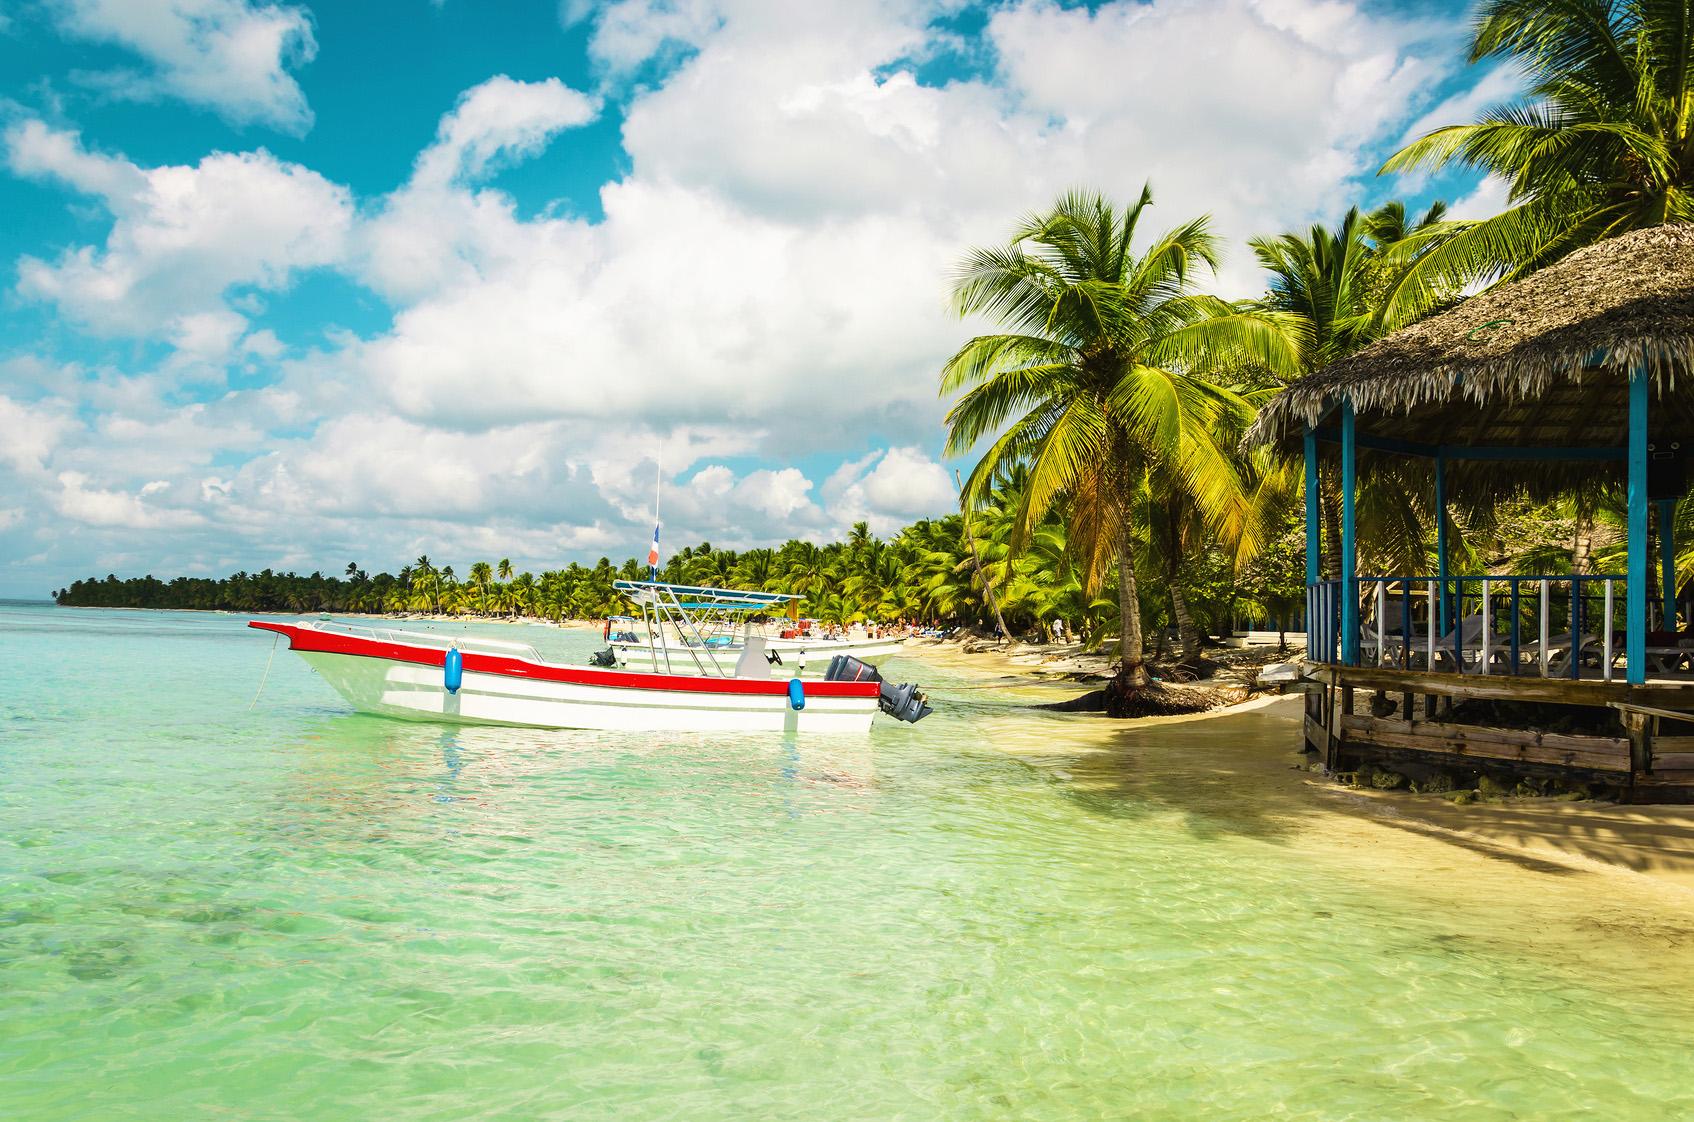 Karibik Palmen Strand Palmenstrand Jamaica Jamaika Dom Rep Dominikanische Republik